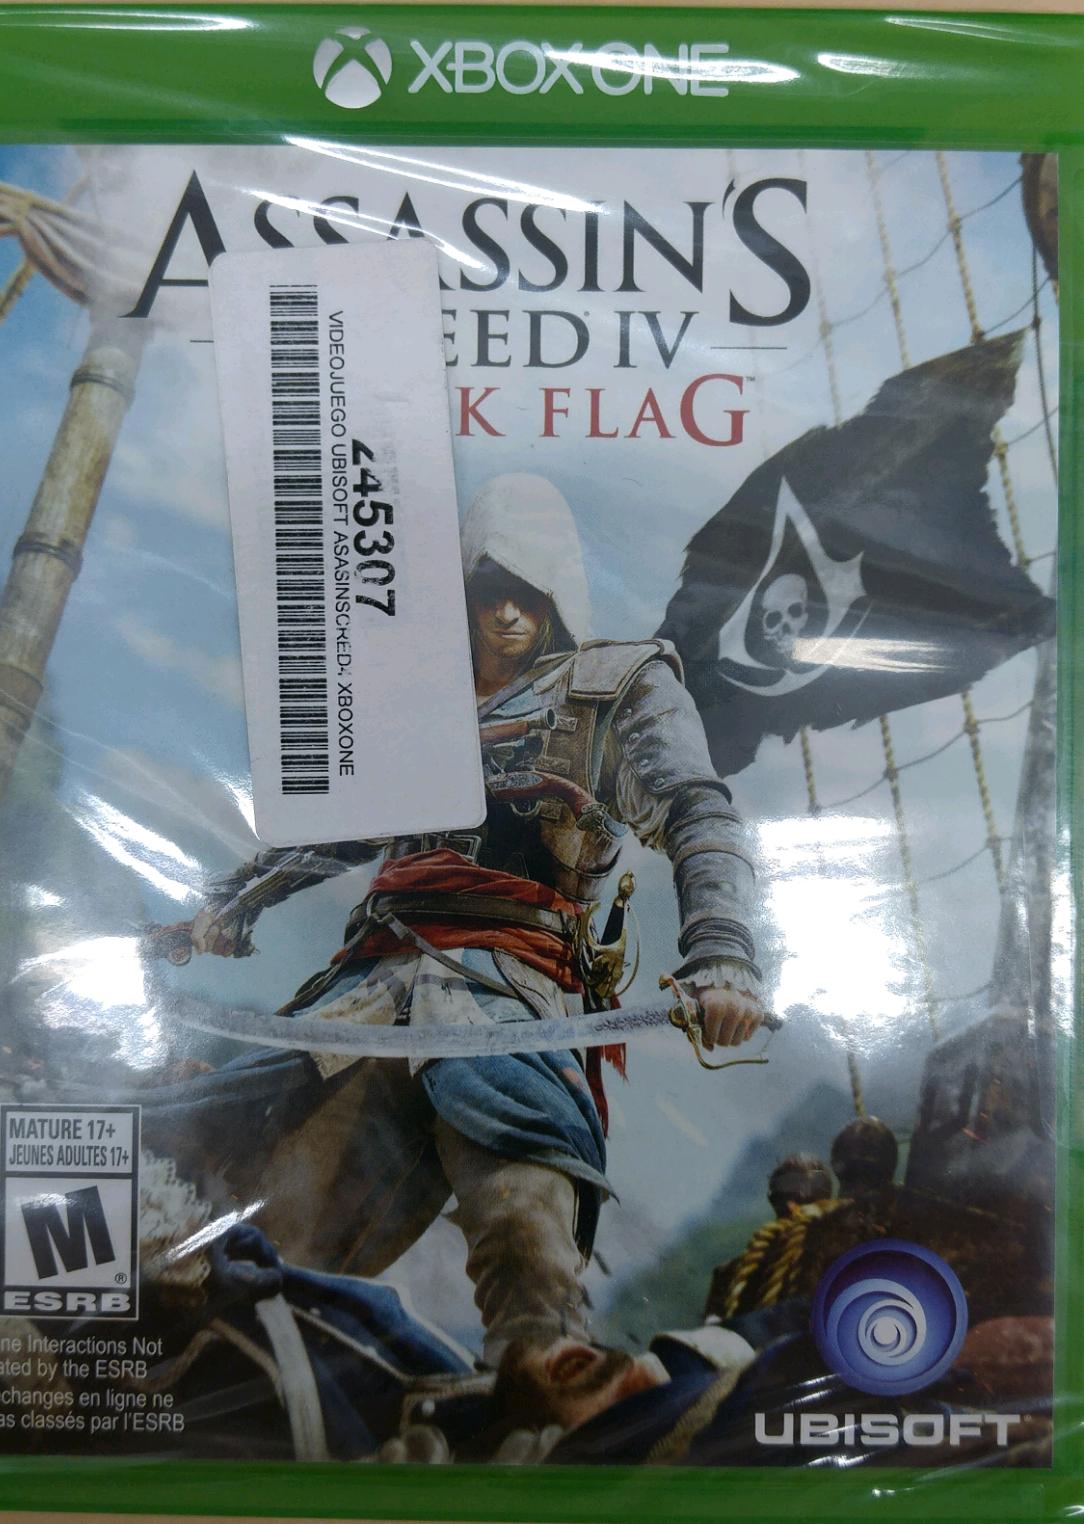 Coppel: Juego Xbox One Black Flag a $130